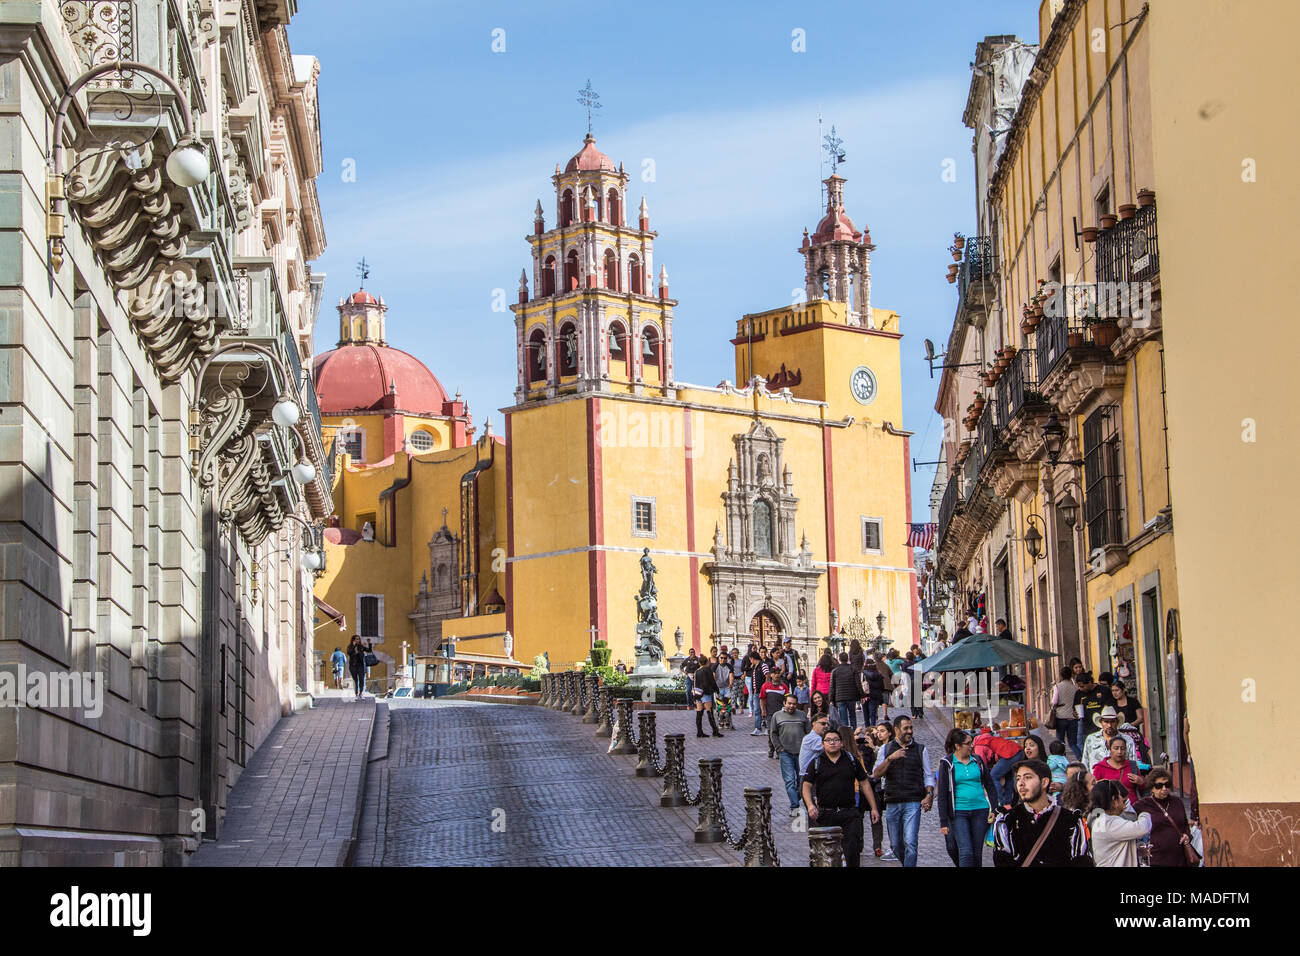 Basilica Colegiata de Nuestra Senora de Guanajuato, or Basilica of Our Lady of Guanajuato,, Mexico - Stock Image